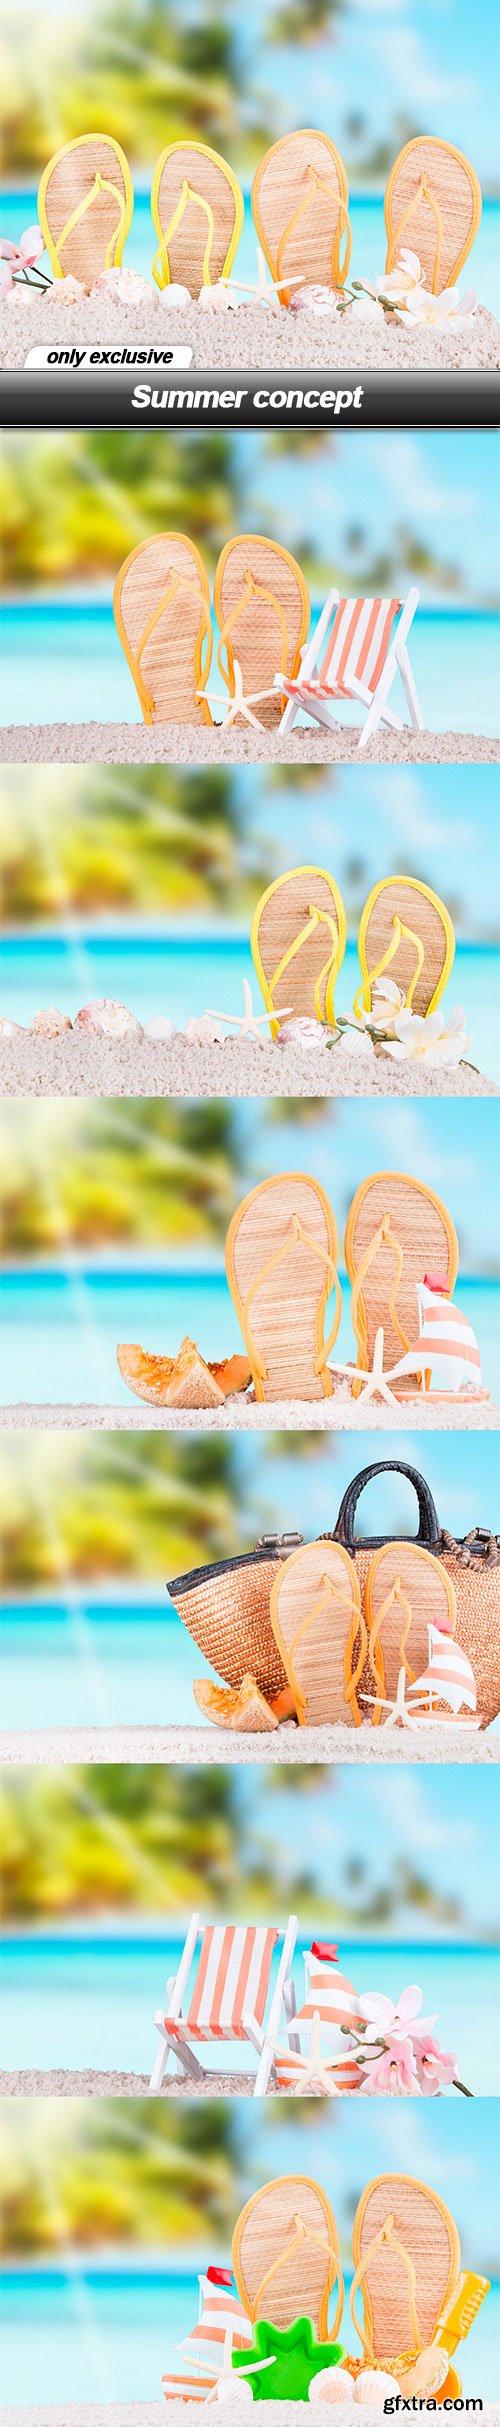 Summer concept - 8 UHQ JPEG